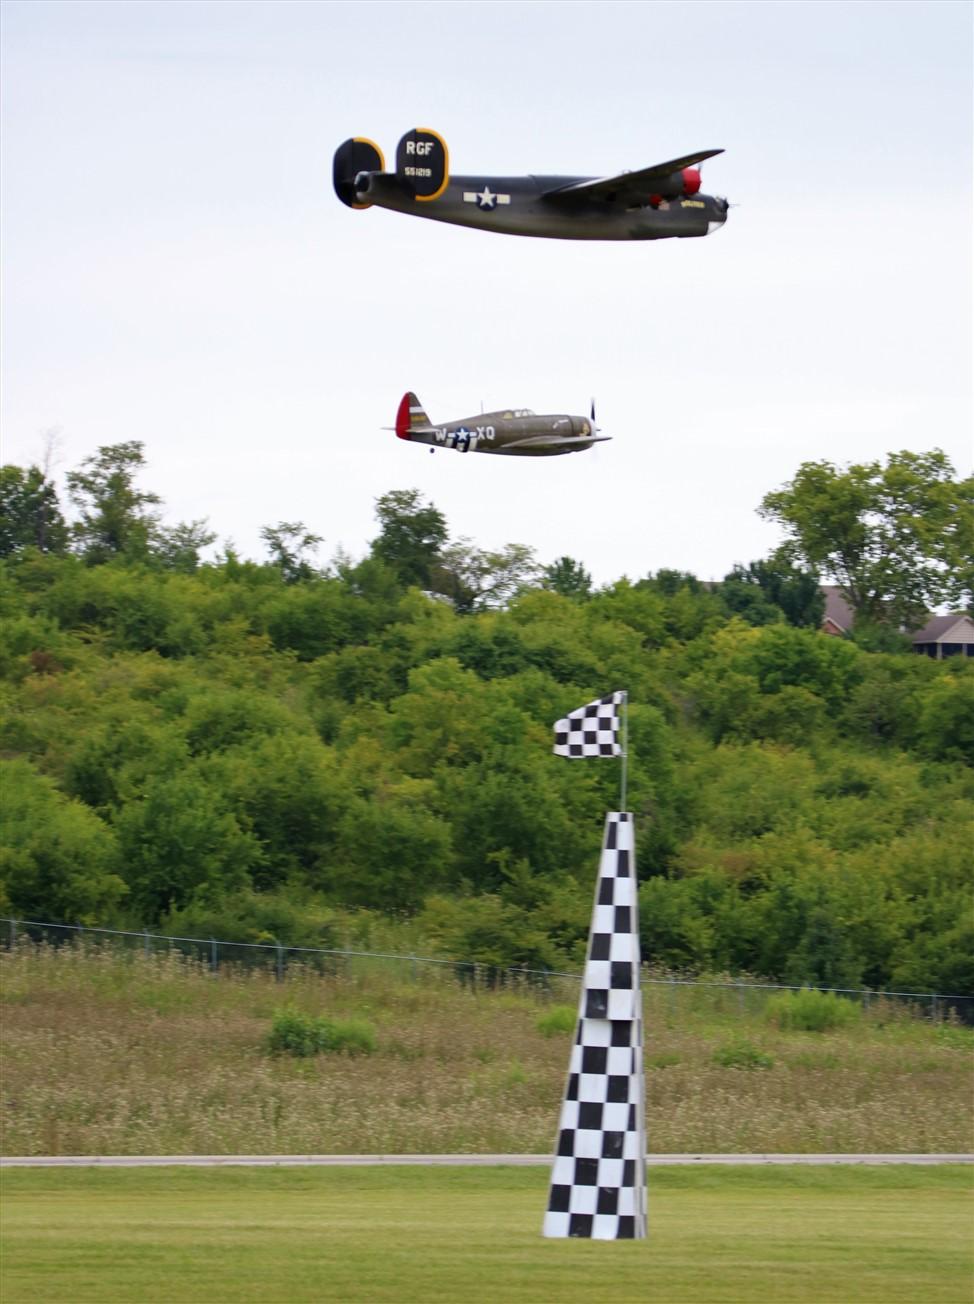 2017 08 06 151 Hamilton OH RC Plane Flying Circus.jpg